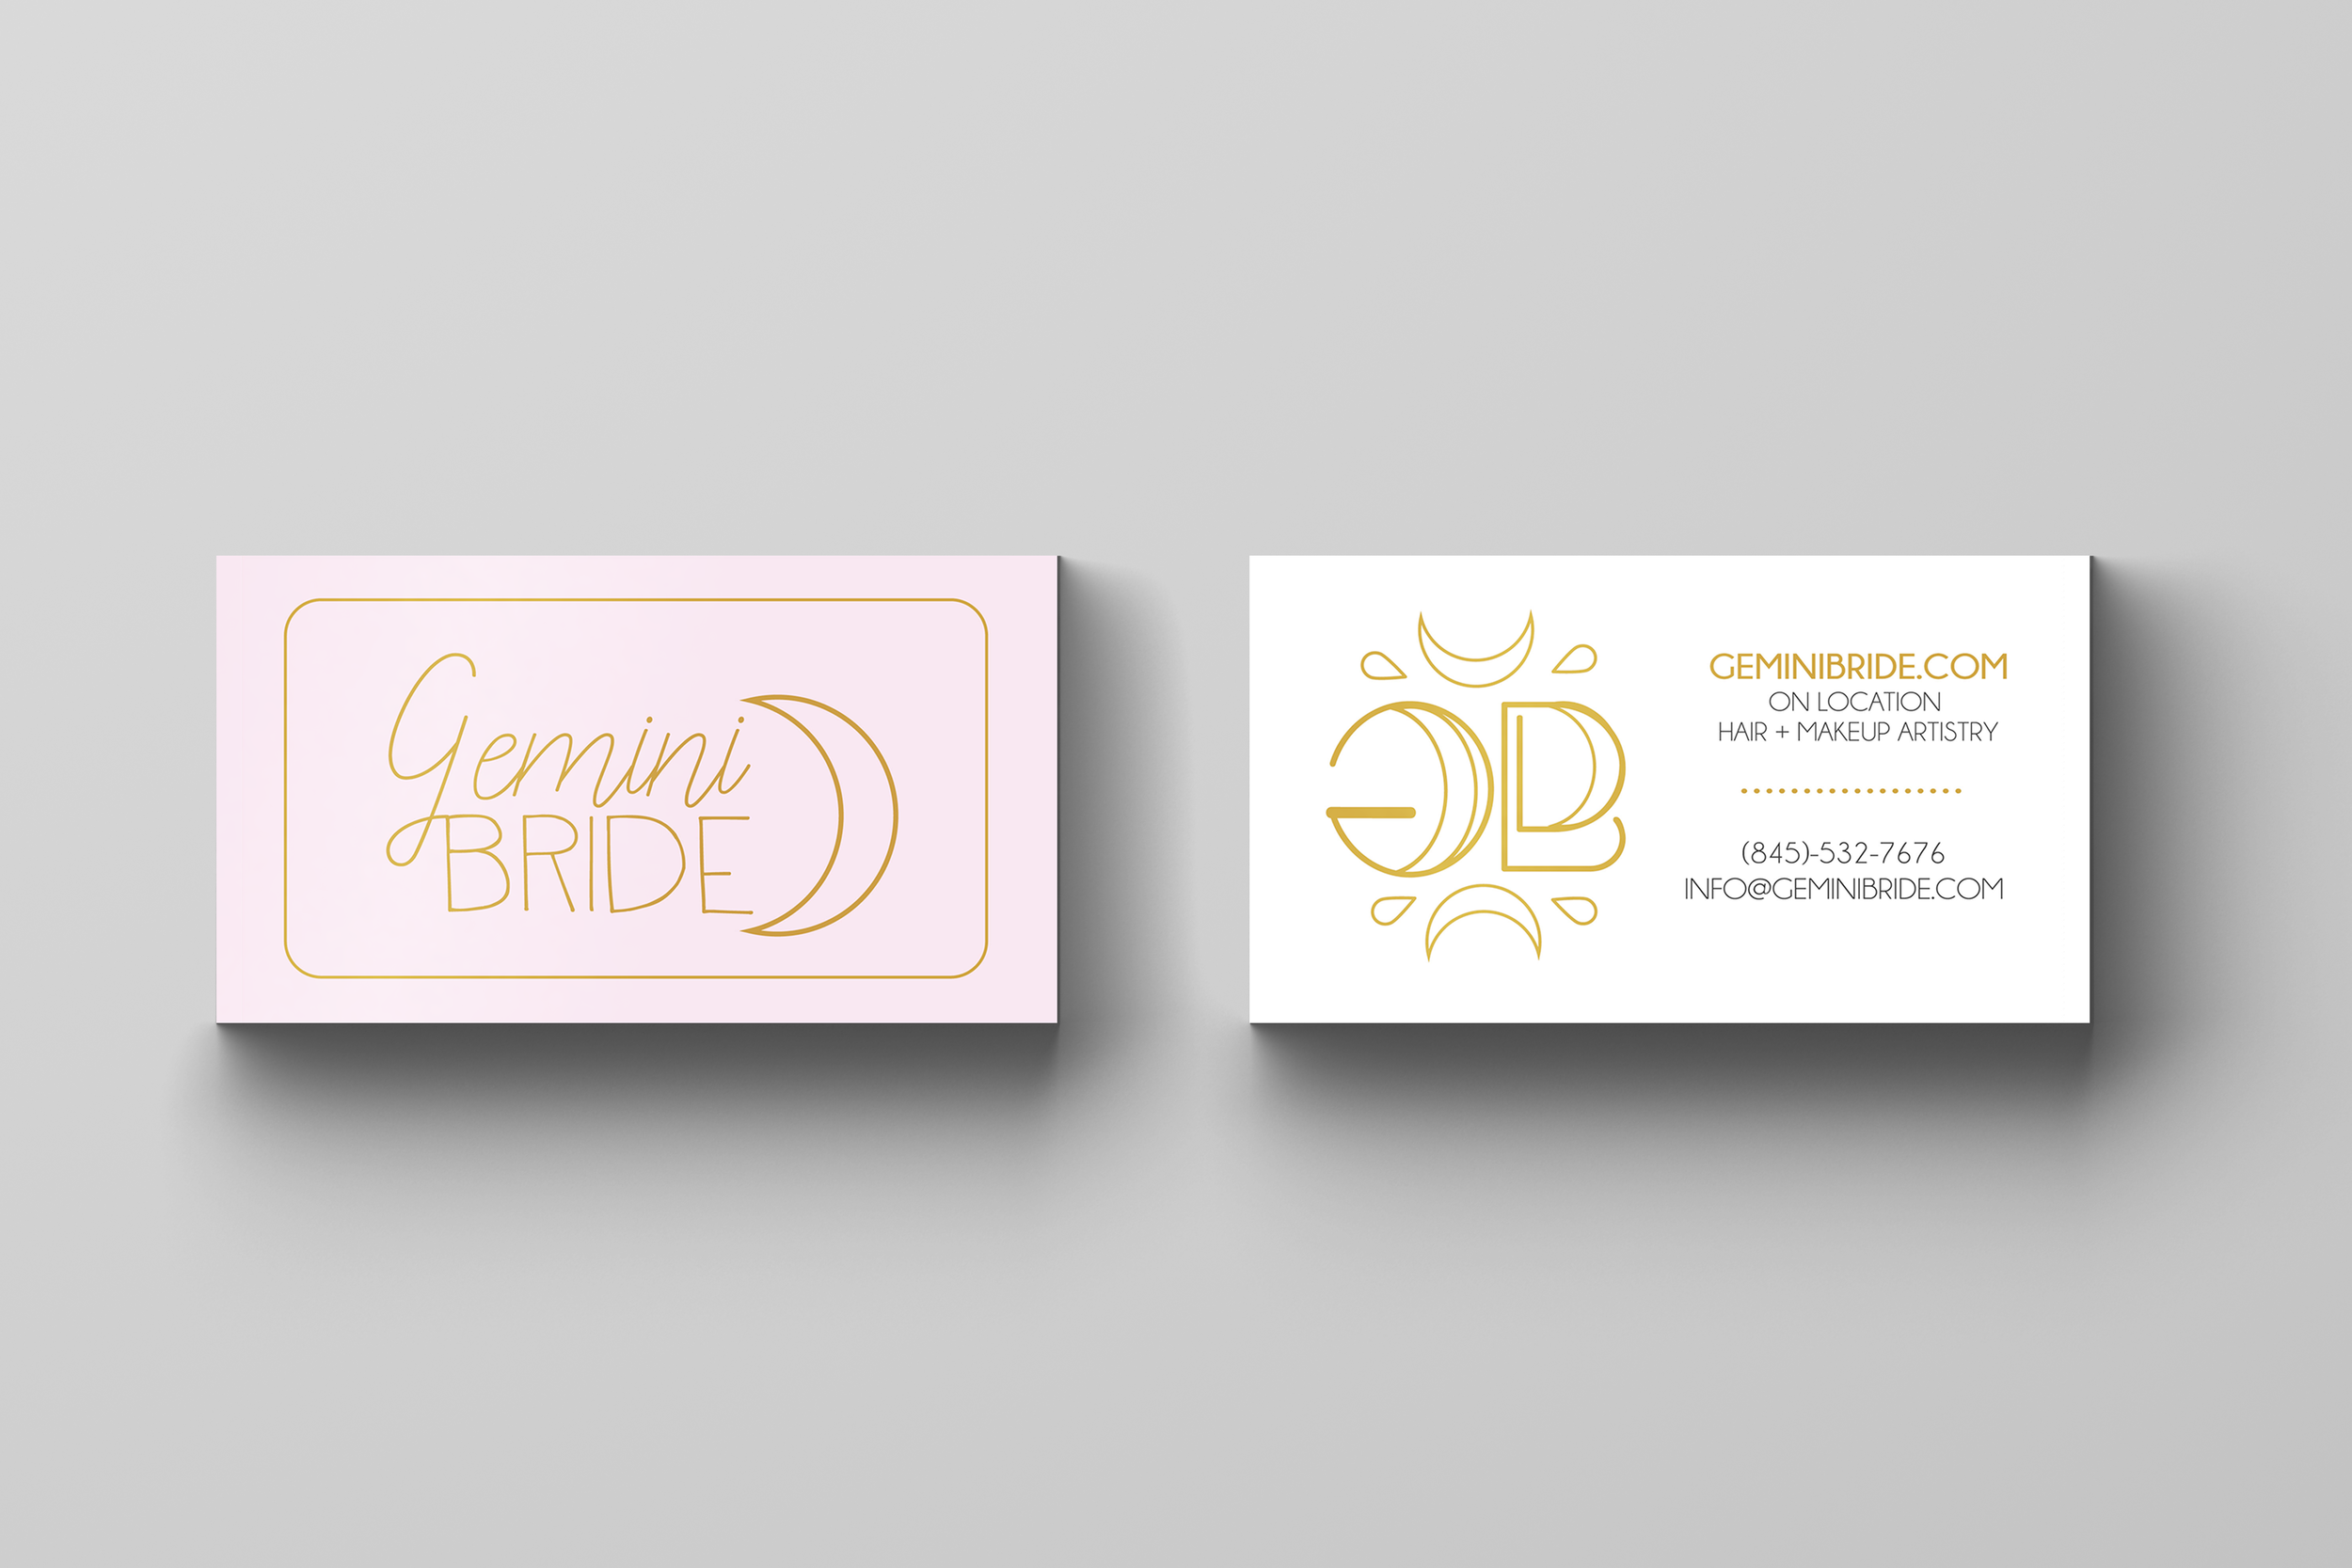 moonrocketmotel_businesscard_geminibride.png